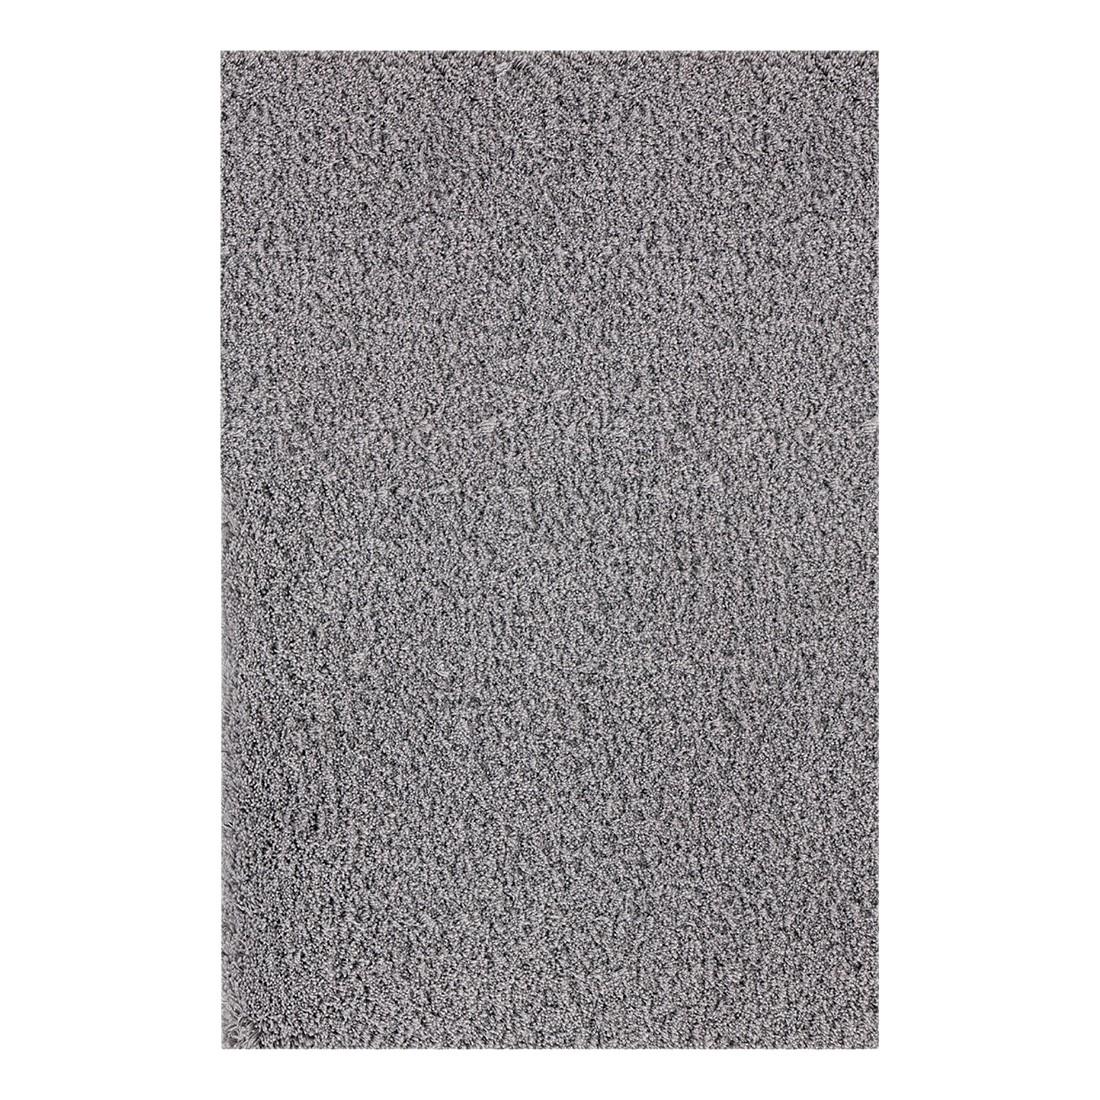 Tapijt Livorno - zilver - 140 x 200 cm, Astra